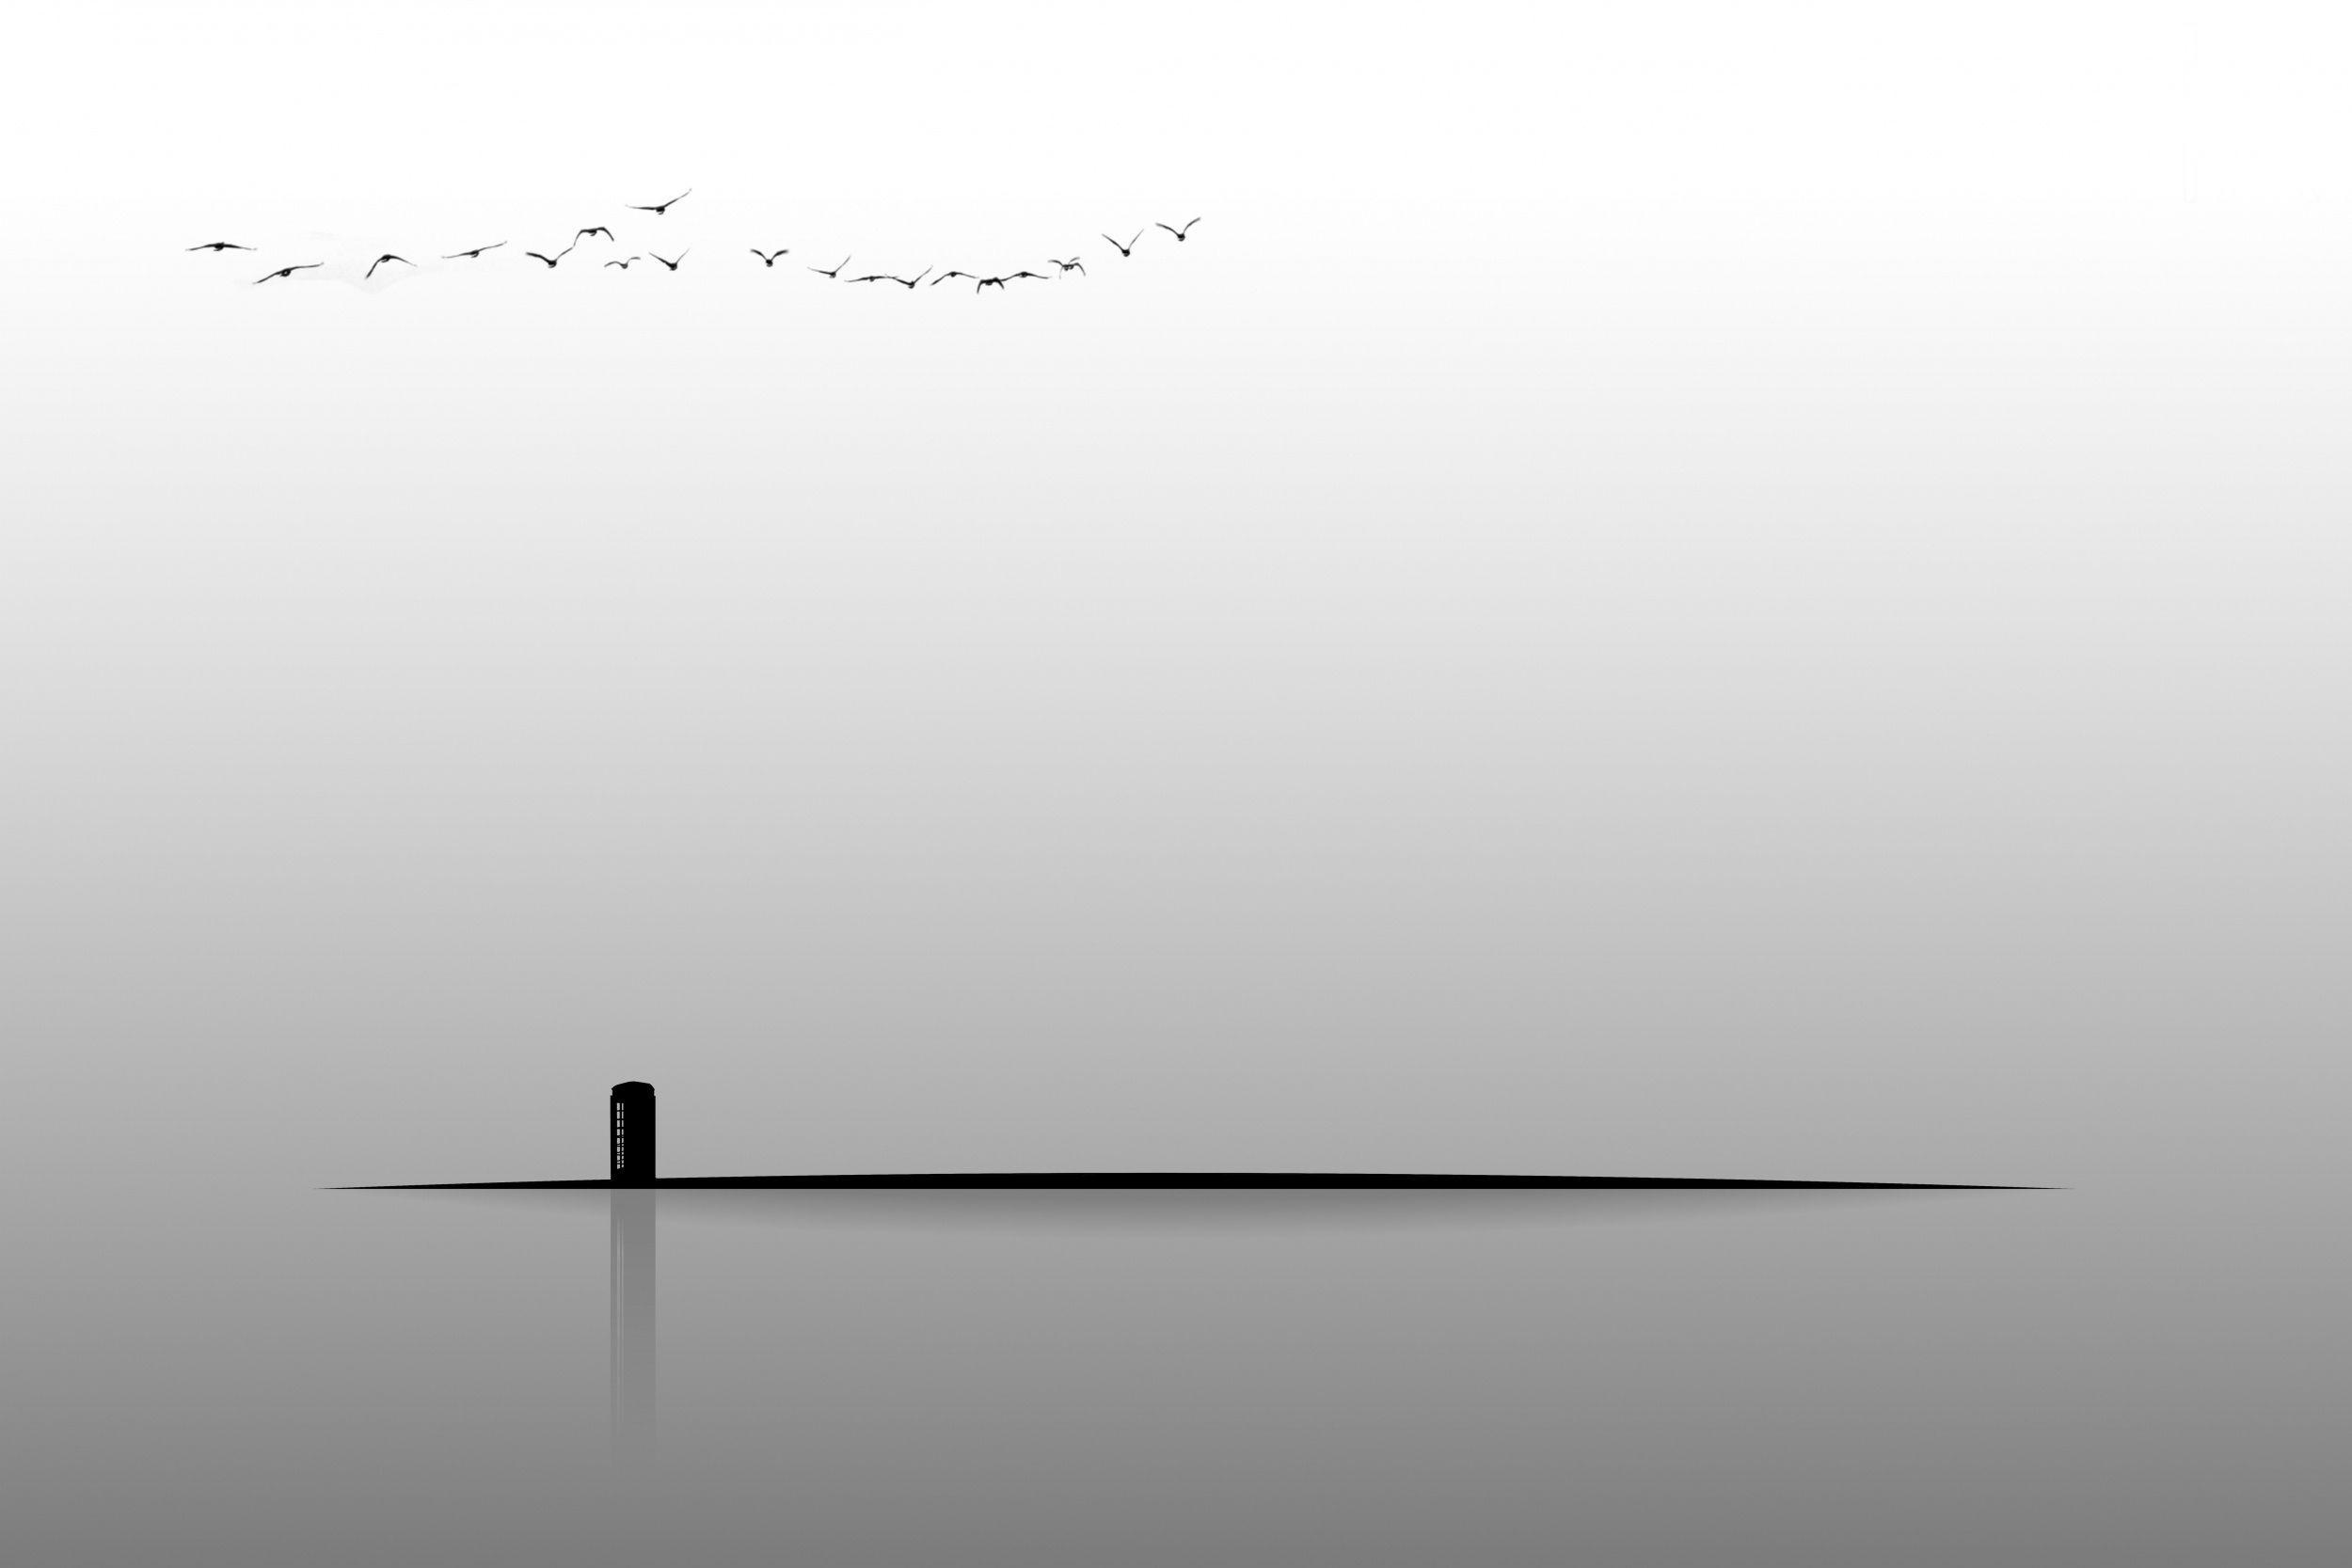 Minimalist Grey Wallpapers - Top Free Minimalist Grey ...